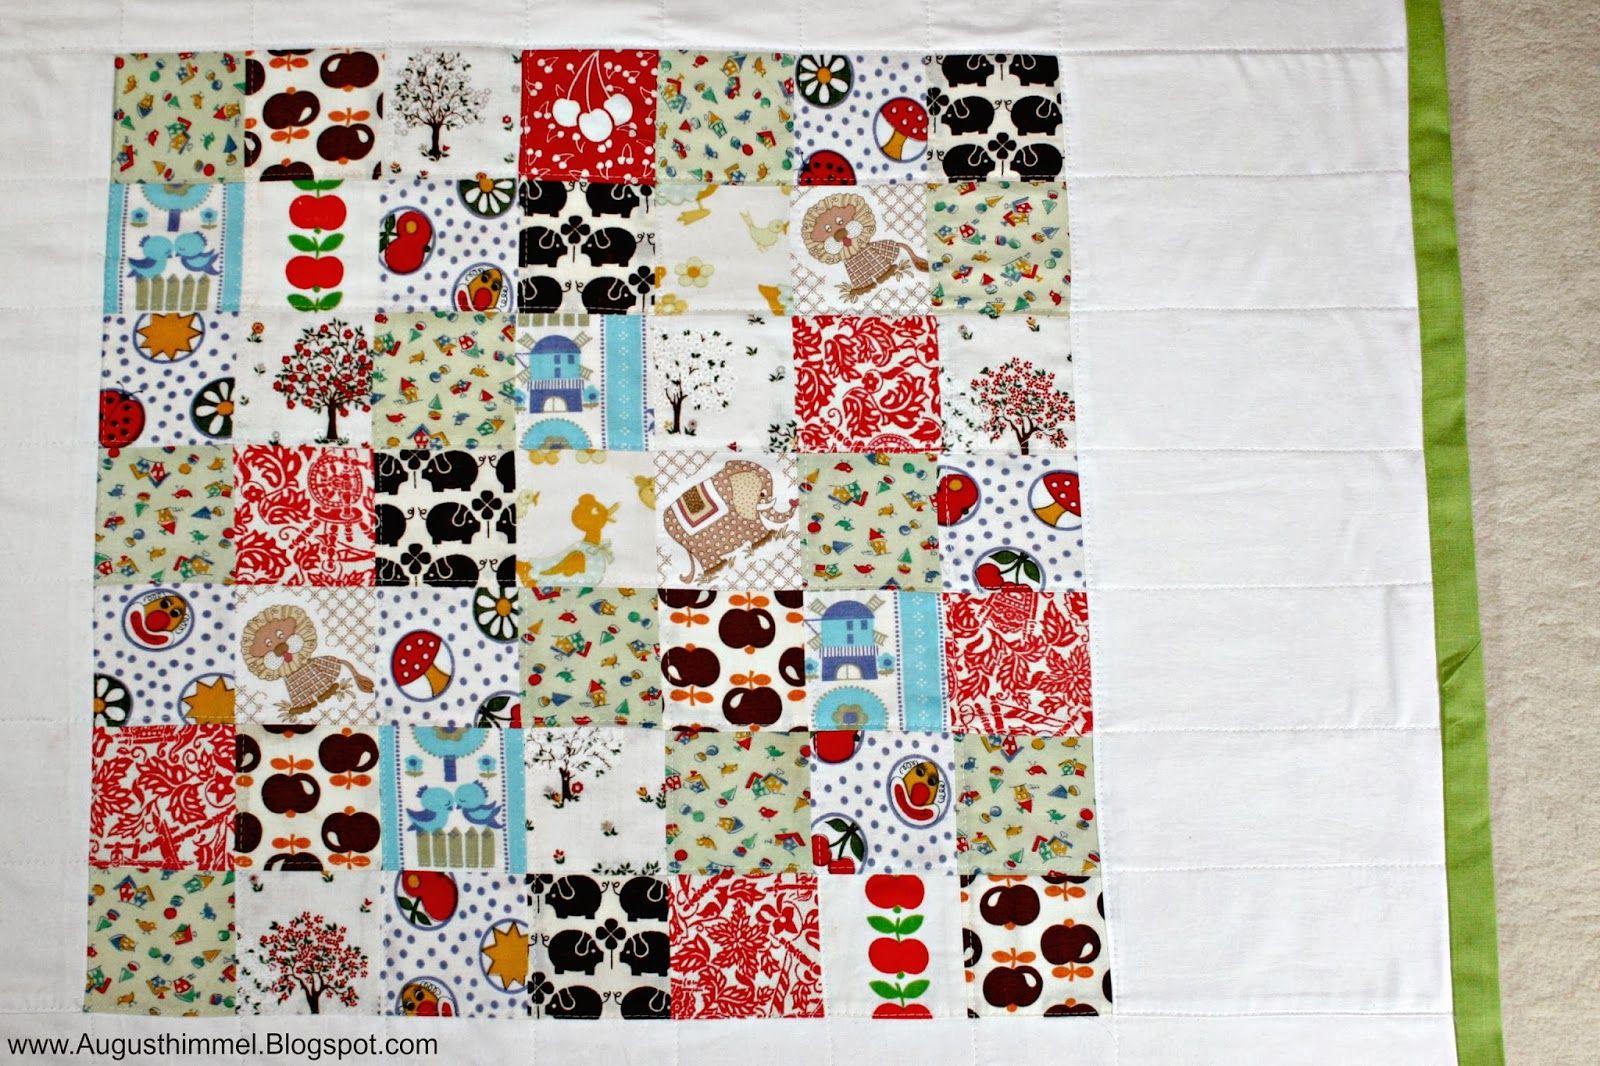 quilt aus stoffresten und alter bettw sche quilt made from scraps of fabric and old bed linen. Black Bedroom Furniture Sets. Home Design Ideas